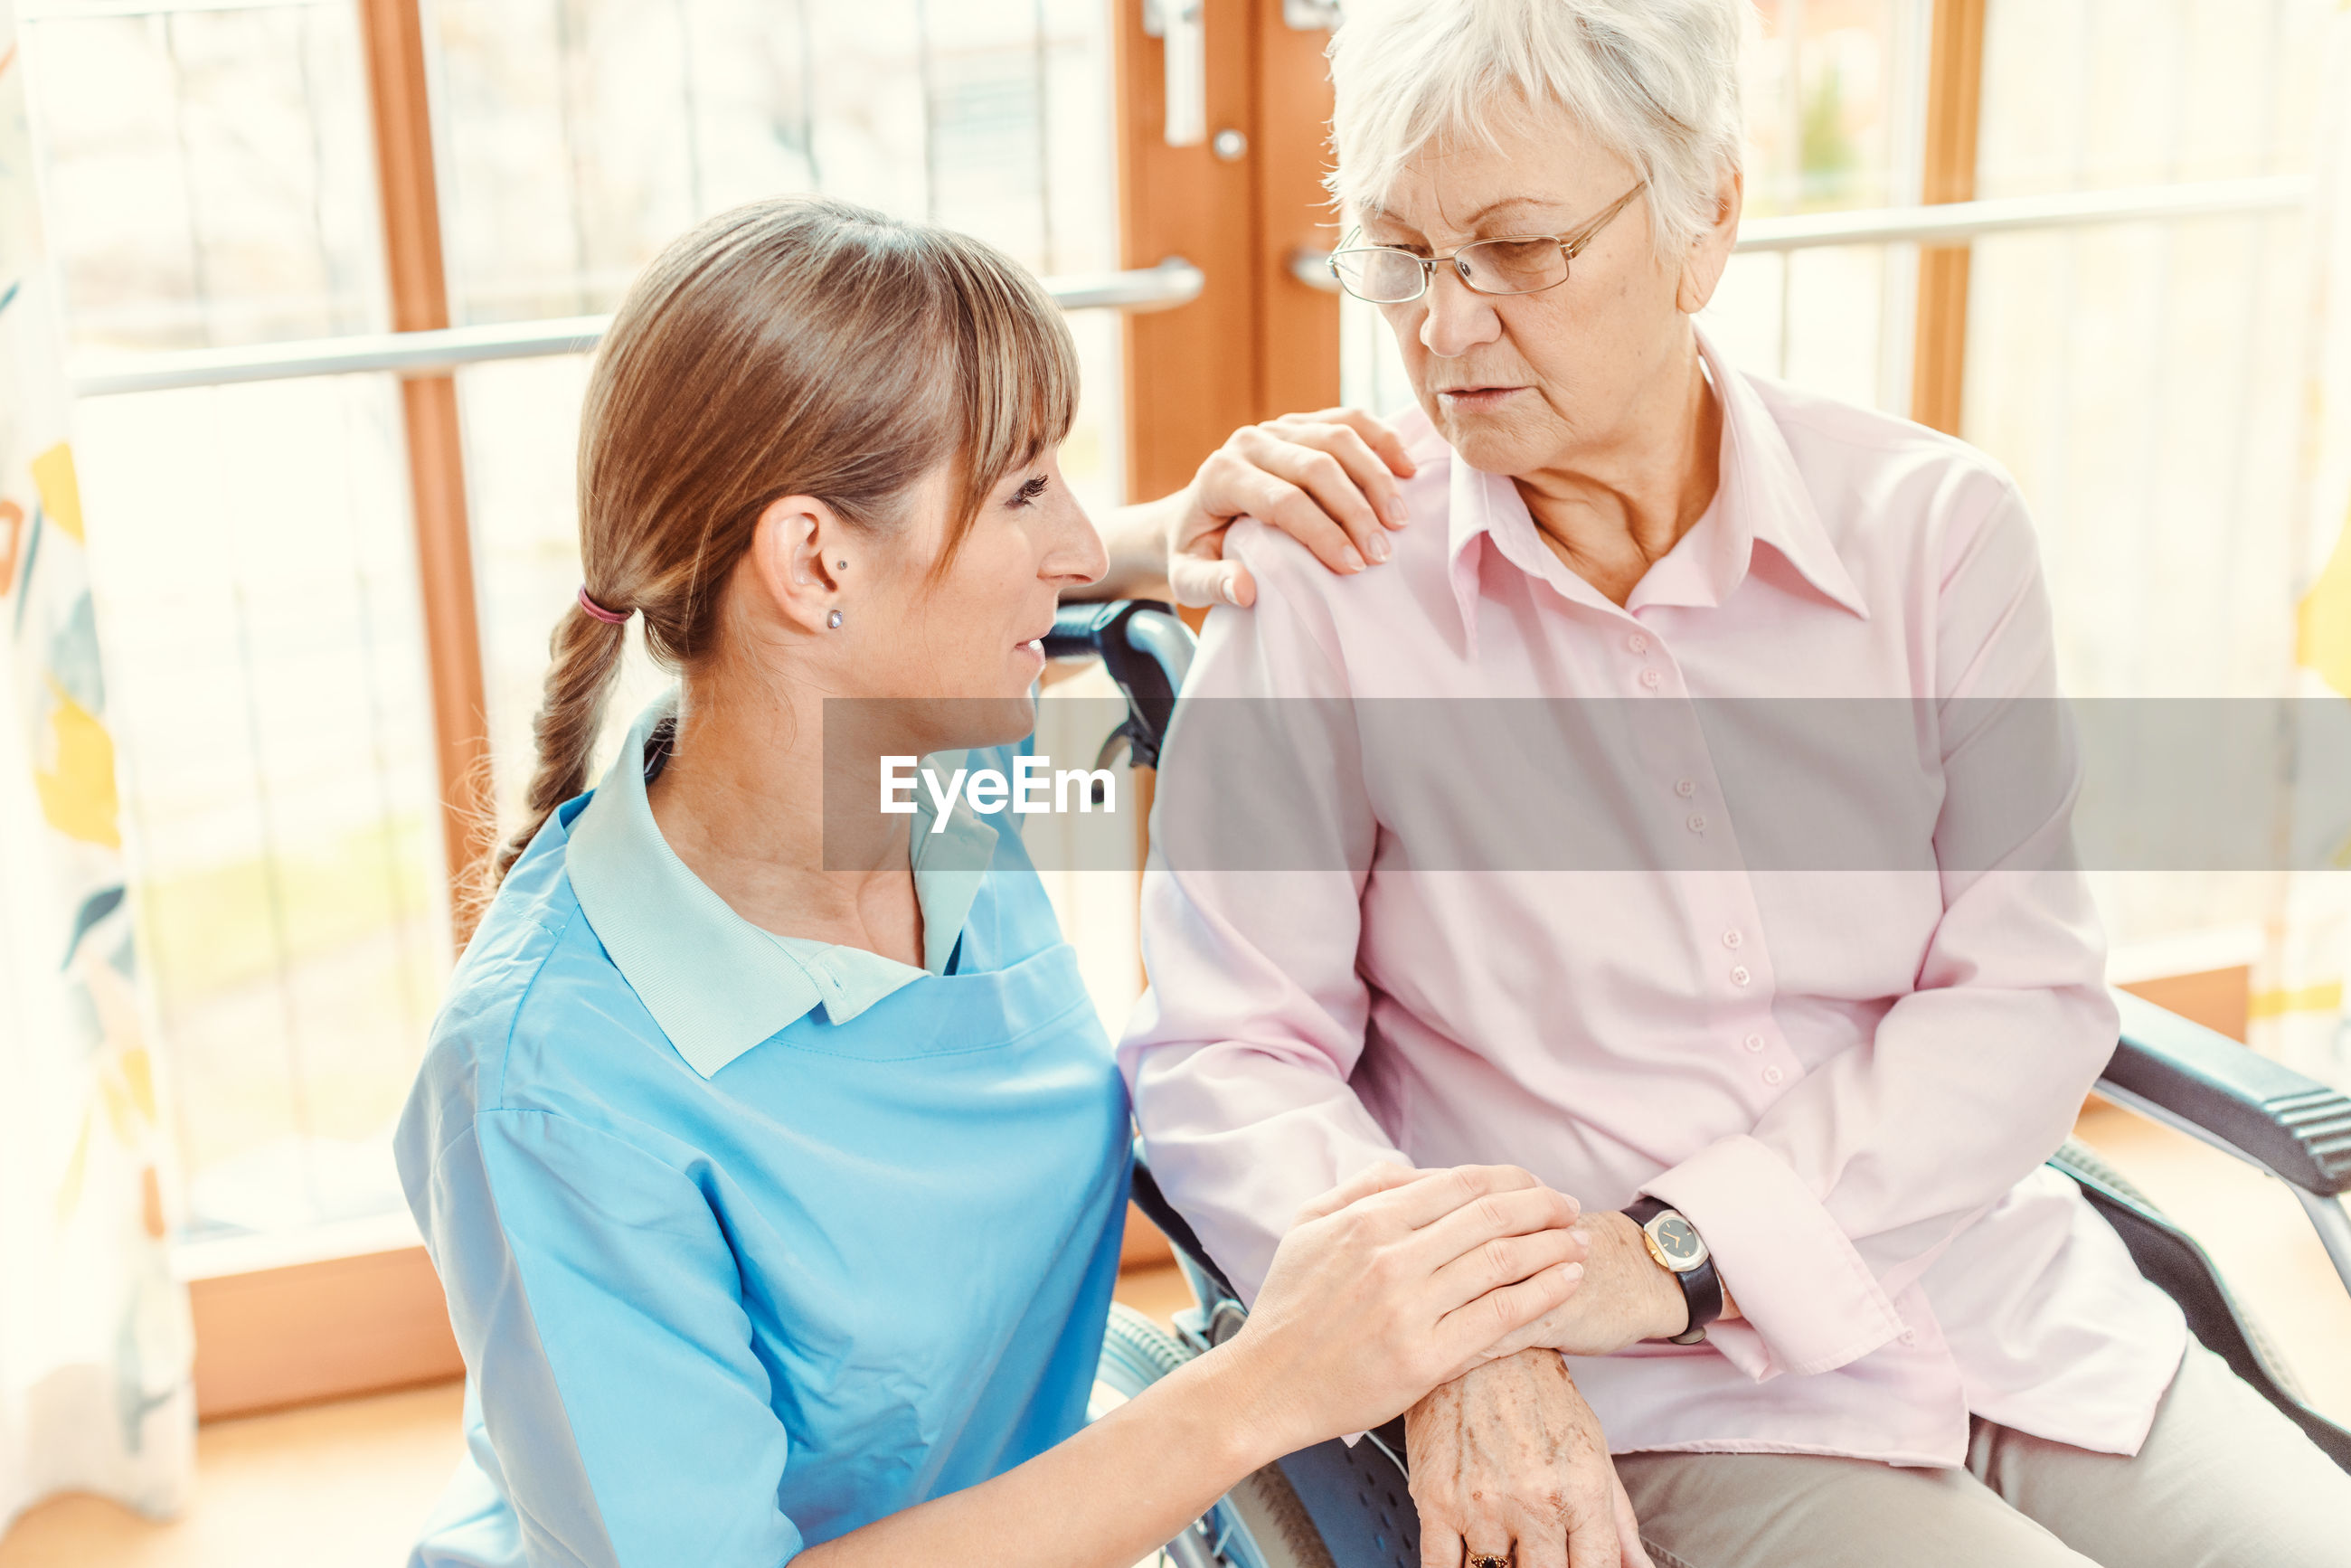 Caretaker consoling senior woman at nursing home